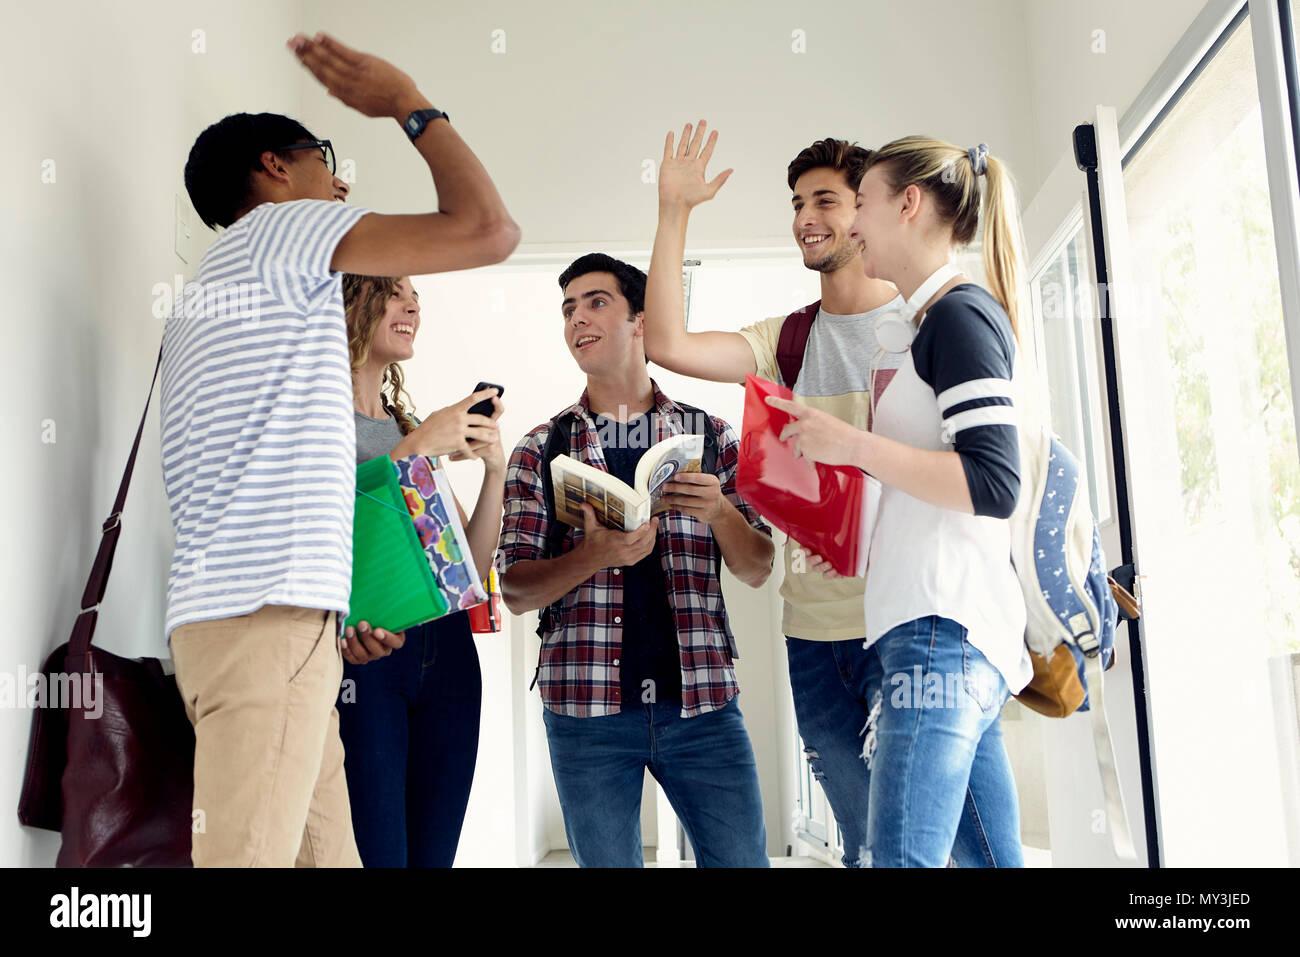 Teenage friend greeting stock photos teenage friend greeting stock students giving each other a high five in corridor stock image m4hsunfo